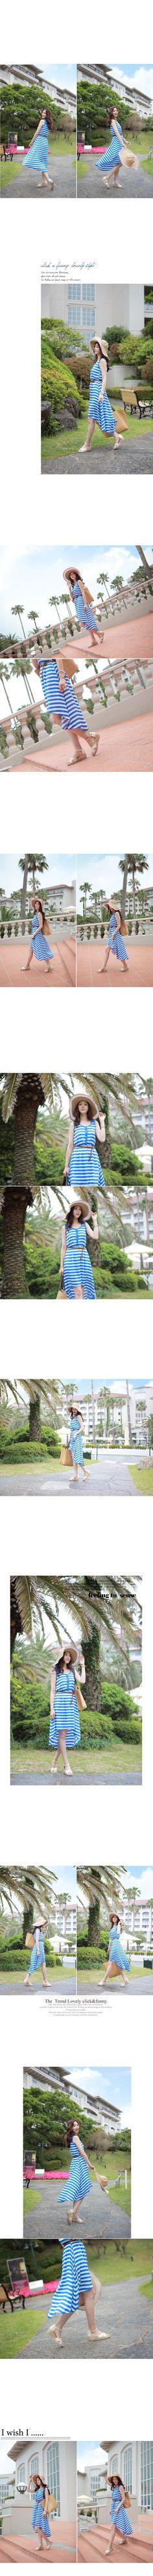 YESSTYLE: CLICK- Sleeveless Stripe Dress